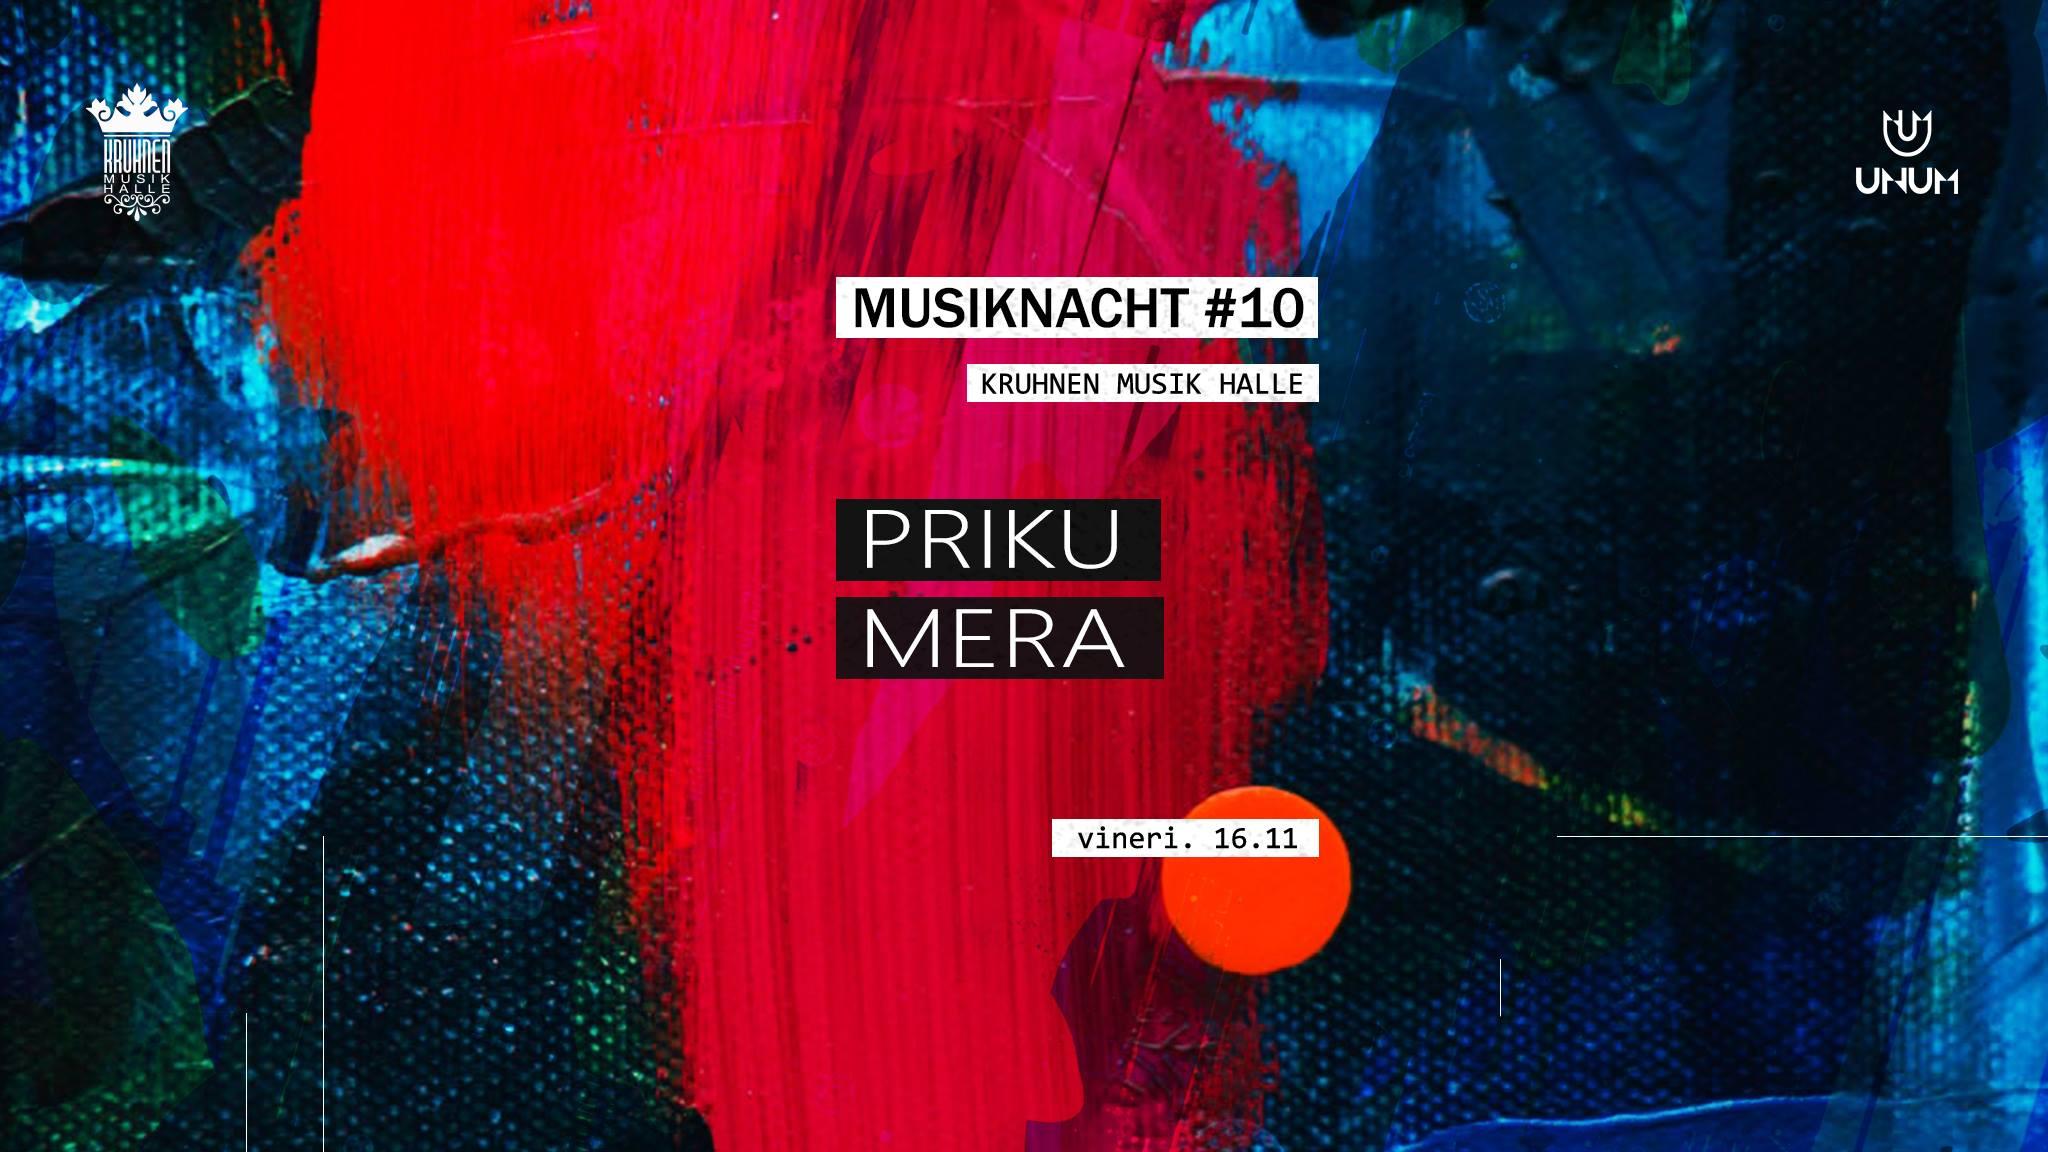 Musiknacht #10: Priku, Mera - 16.11